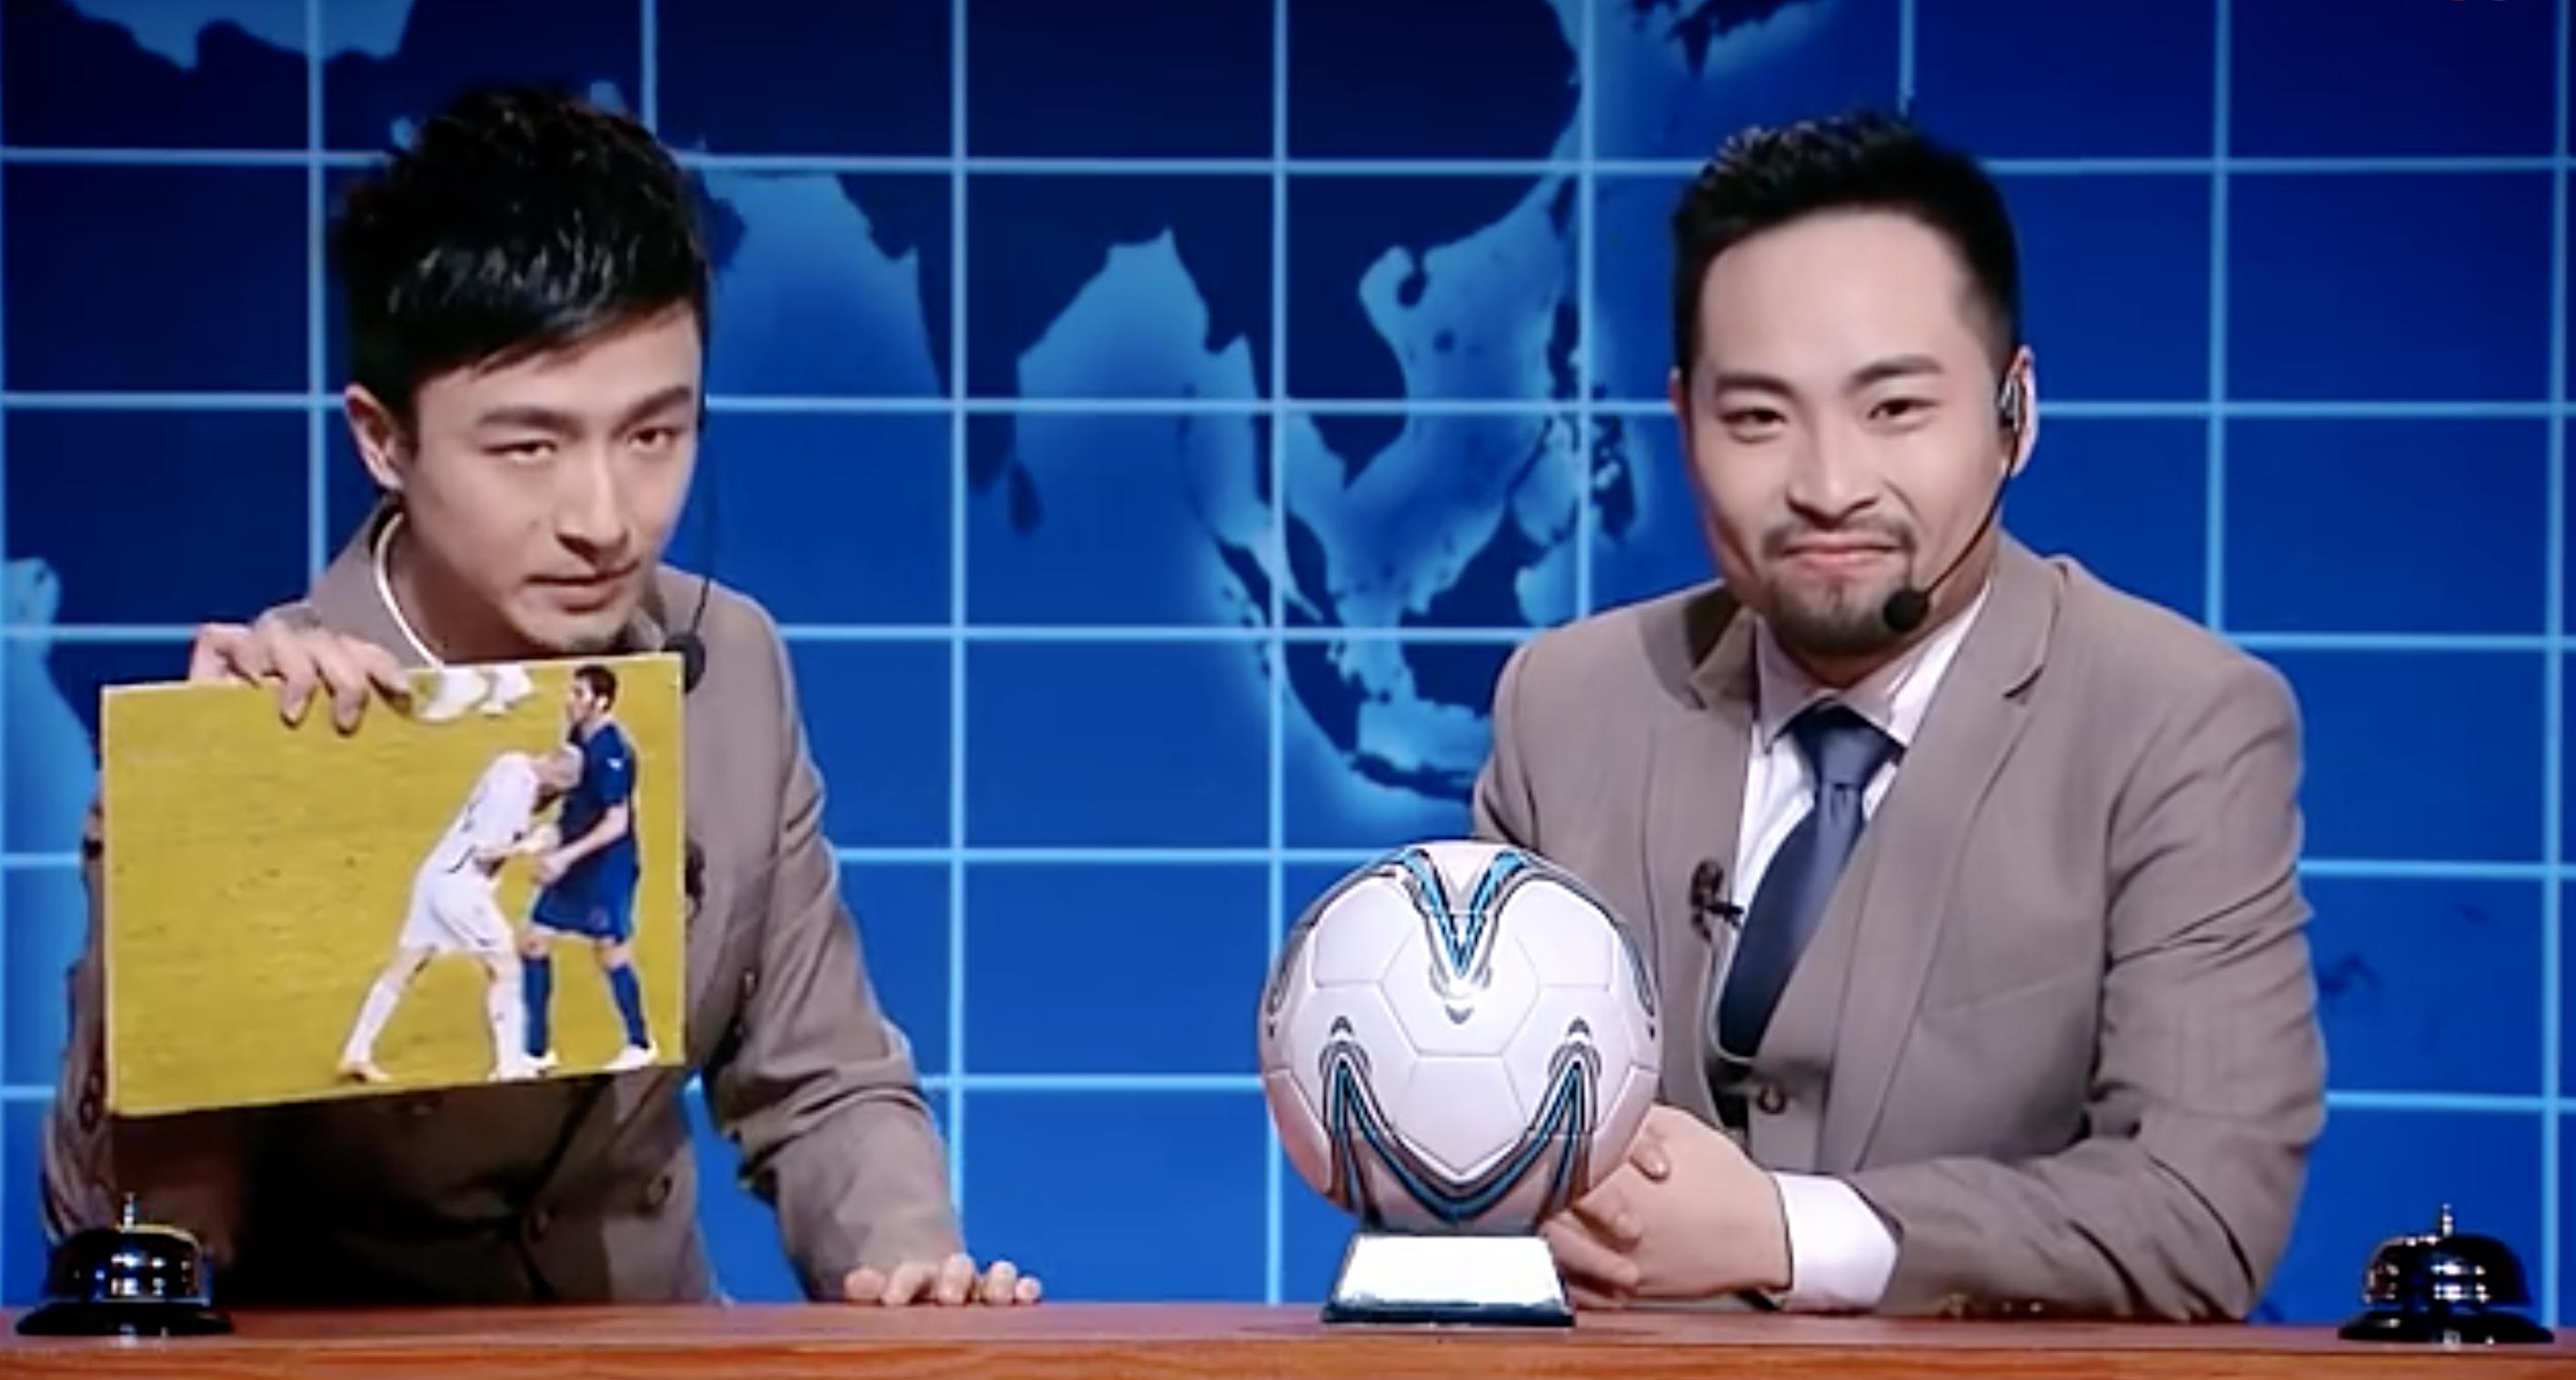 A football skits on Saturday Night Live China.